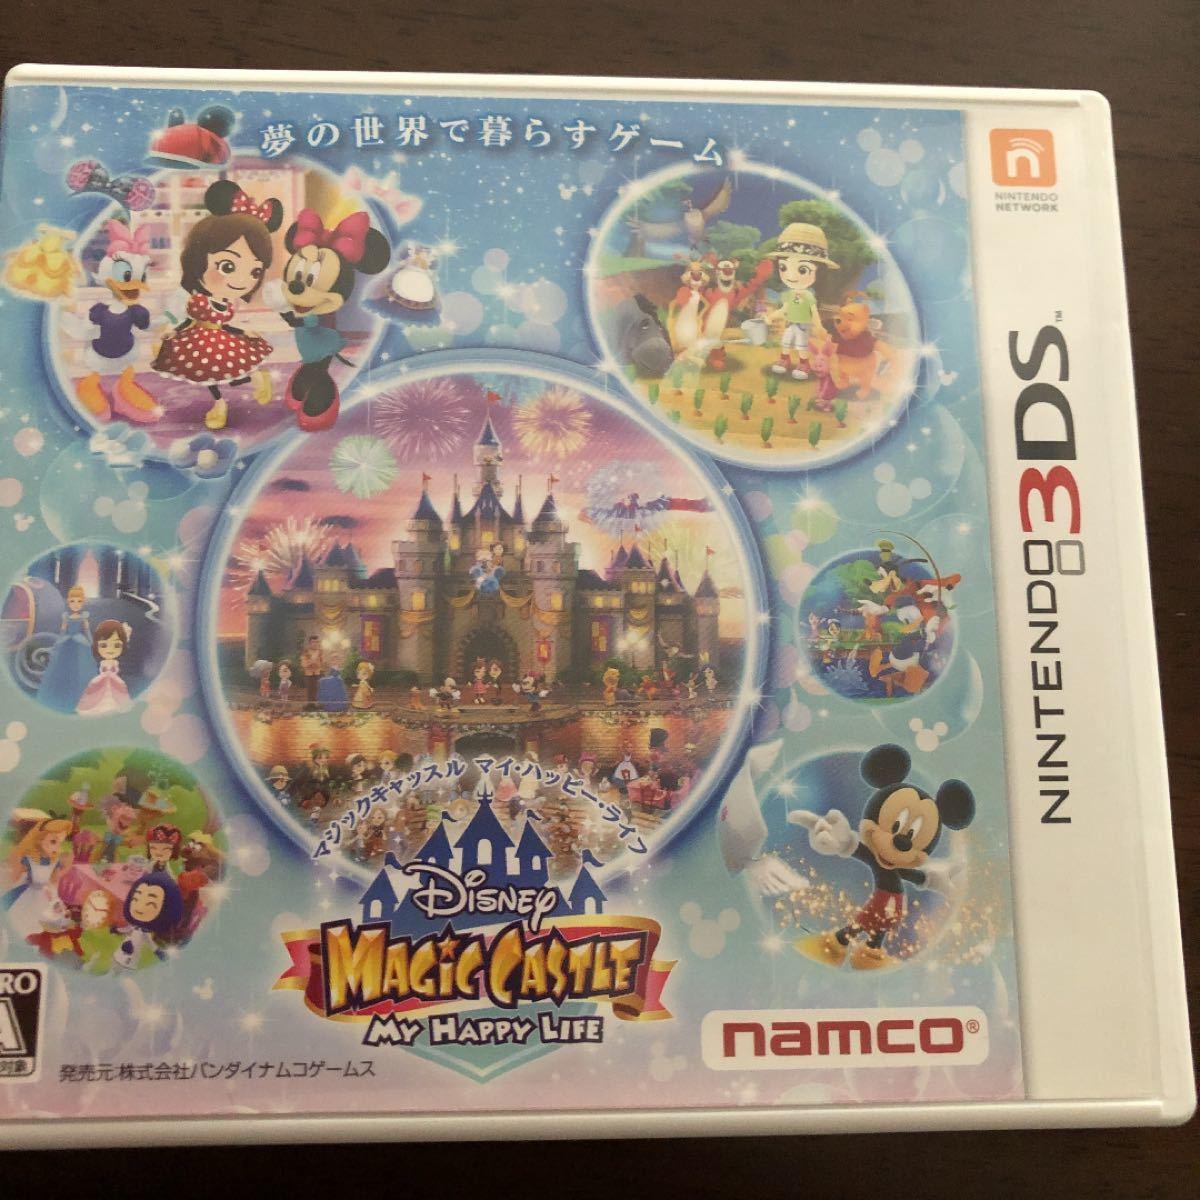 【3DS】 ディズニー マジックキャッスル マイ・ハッピー・ライフ [通常版]5月末削除